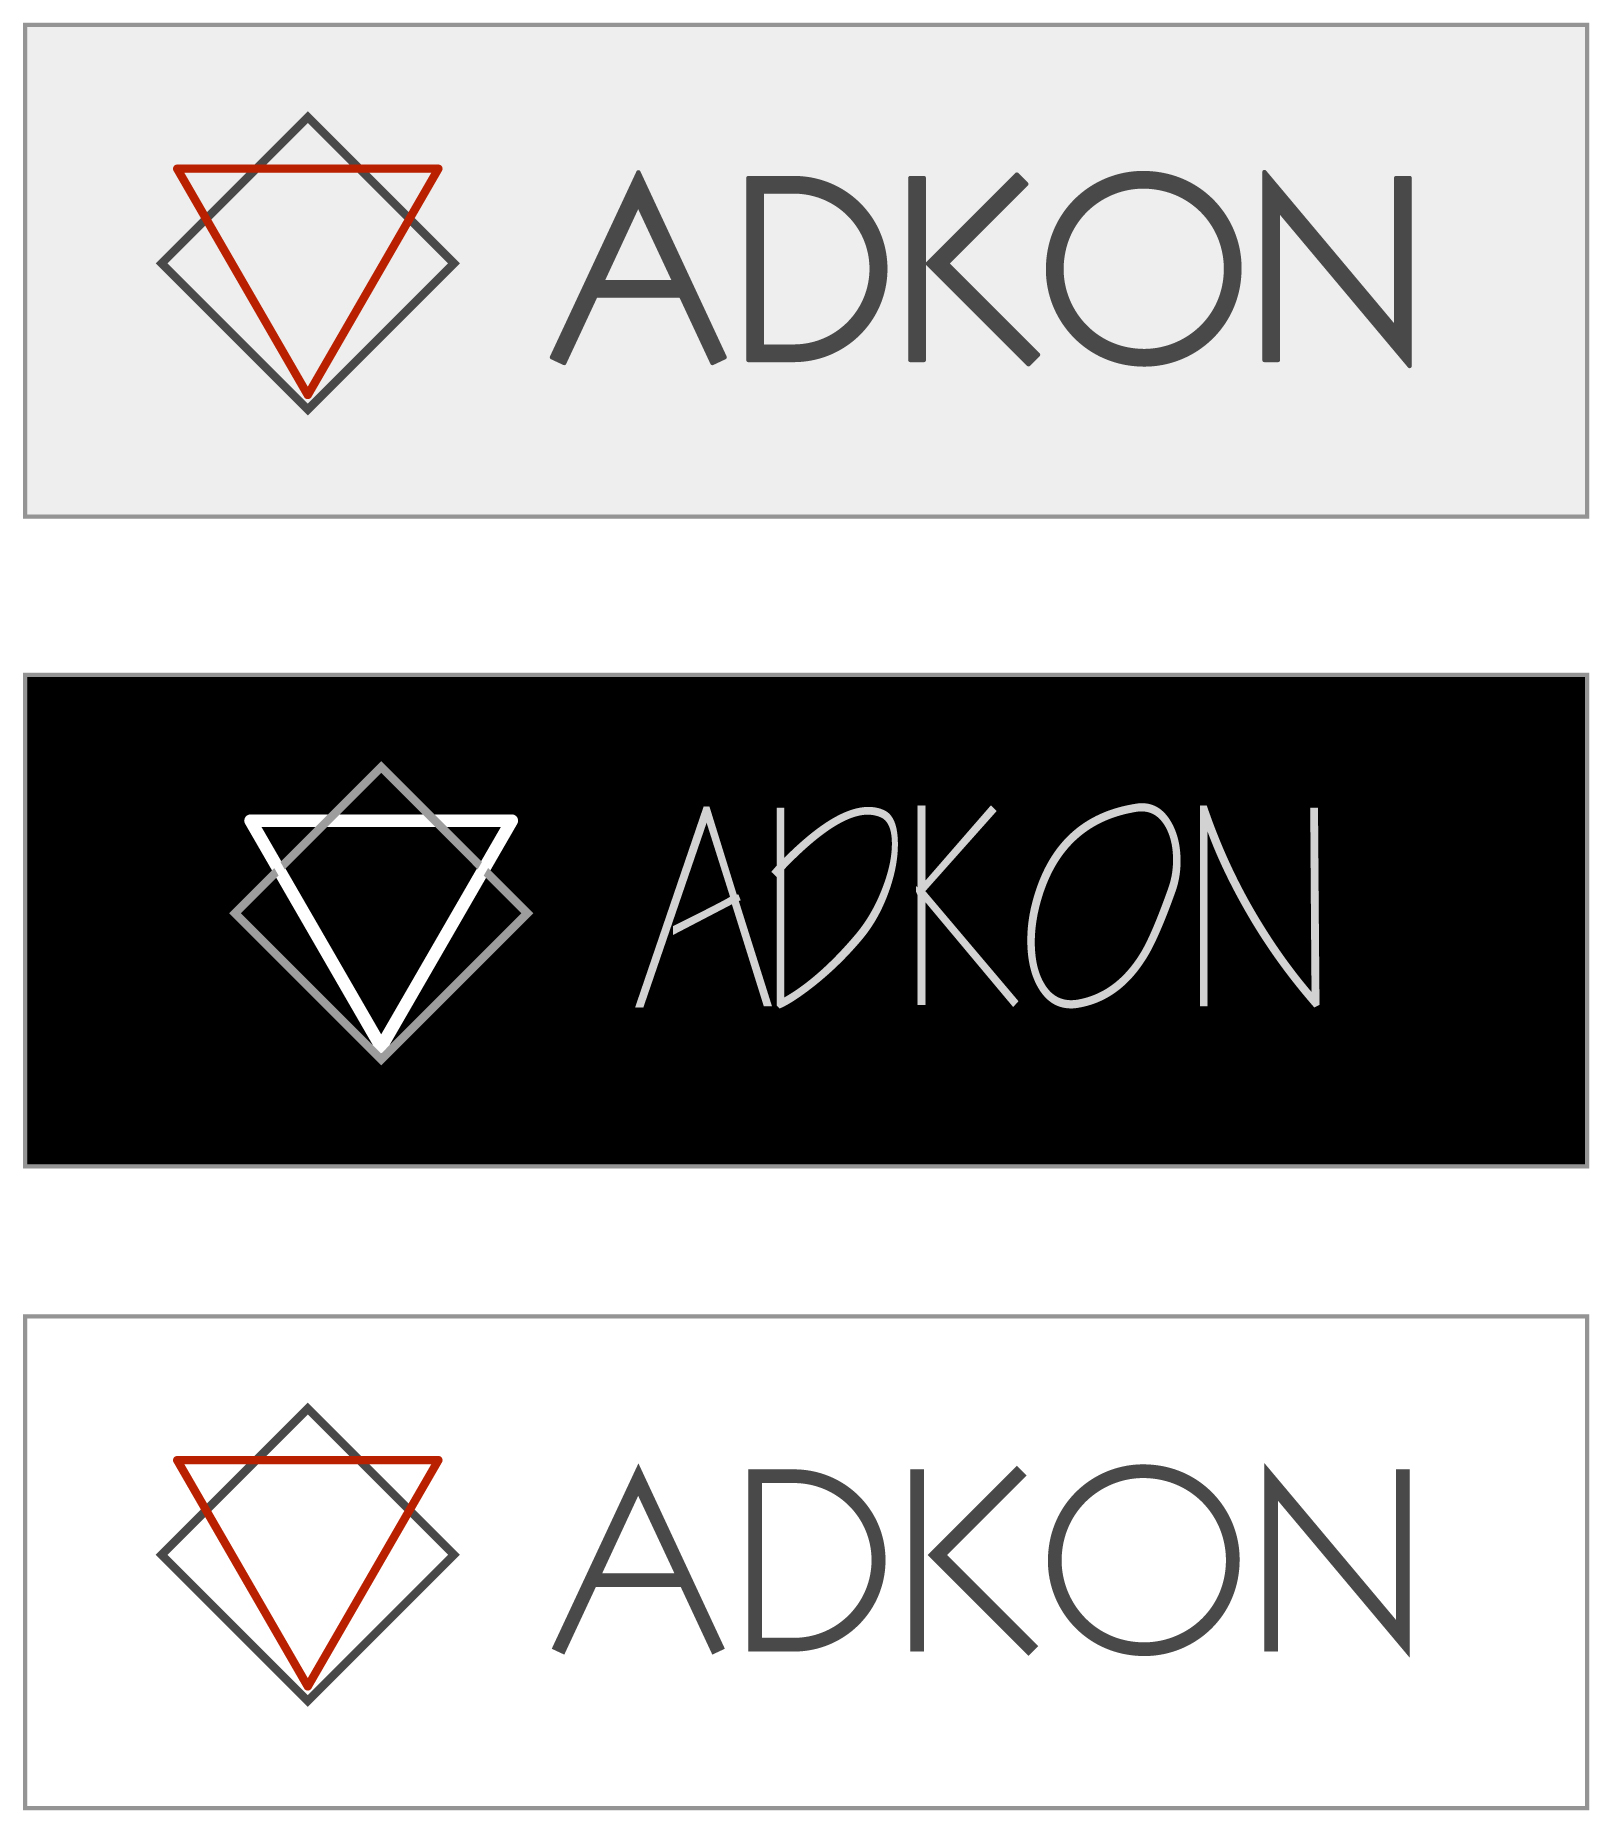 Разработка логотипа для компании фото f_4405965e52ebddfc.jpg